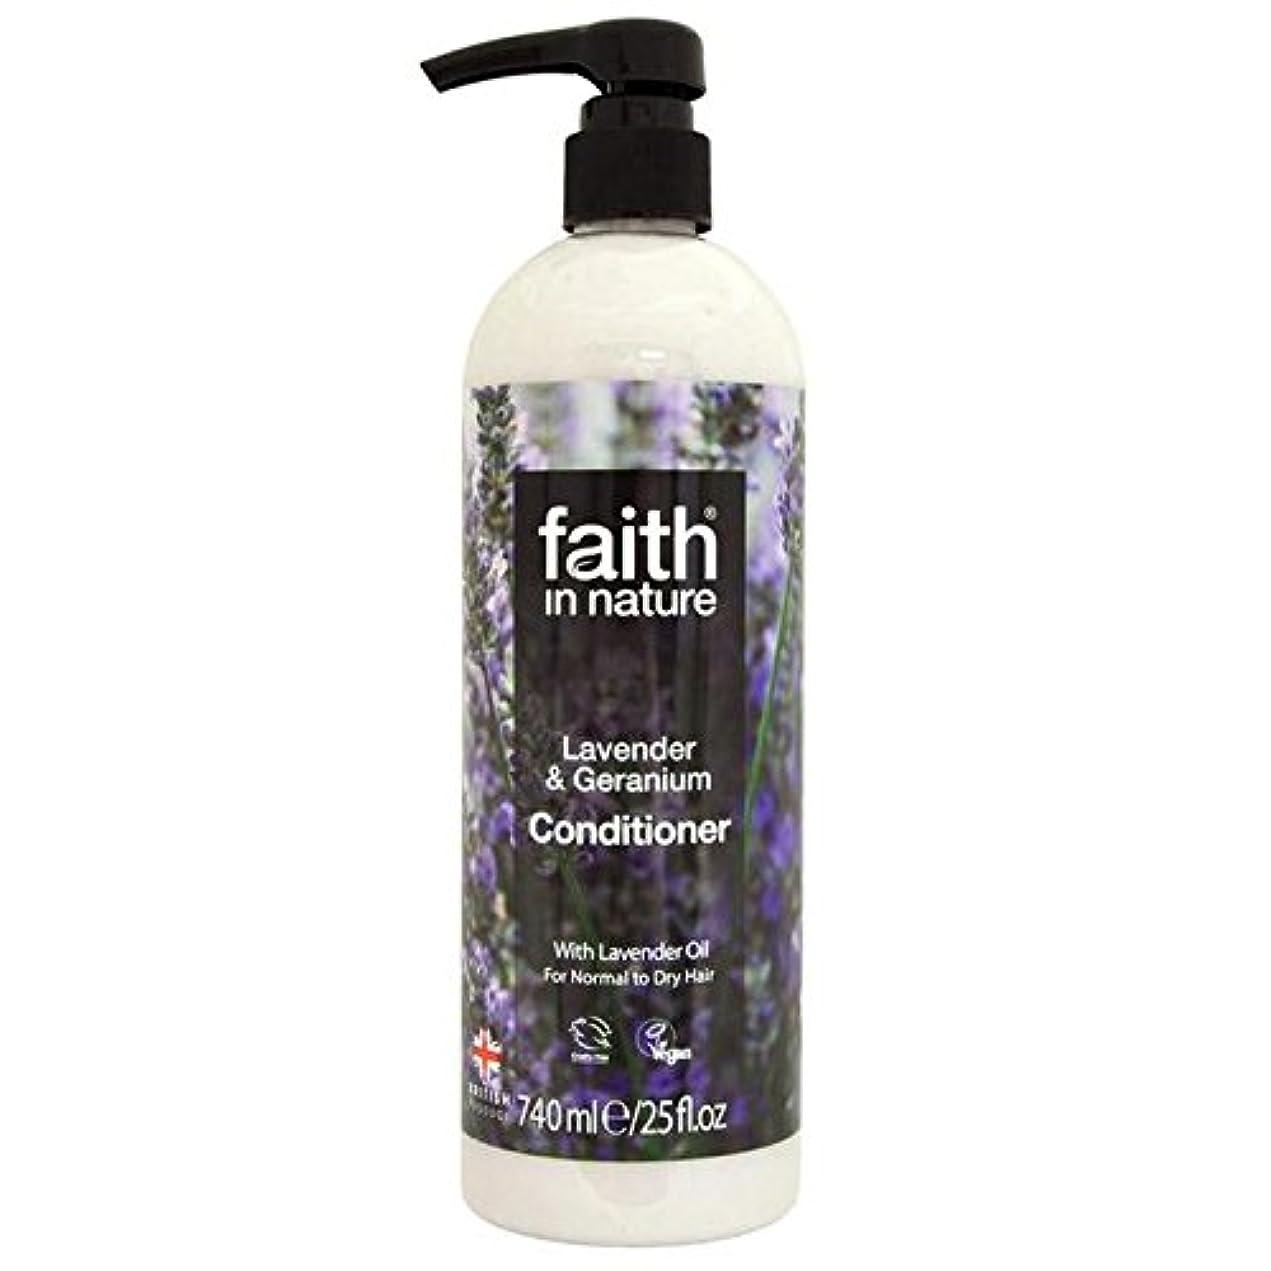 Faith in Nature Lavender & Geranium Conditioner 740ml - (Faith In Nature) 自然ラベンダー&ゼラニウムコンディショナー740ミリリットルの信仰 [並行輸入品]